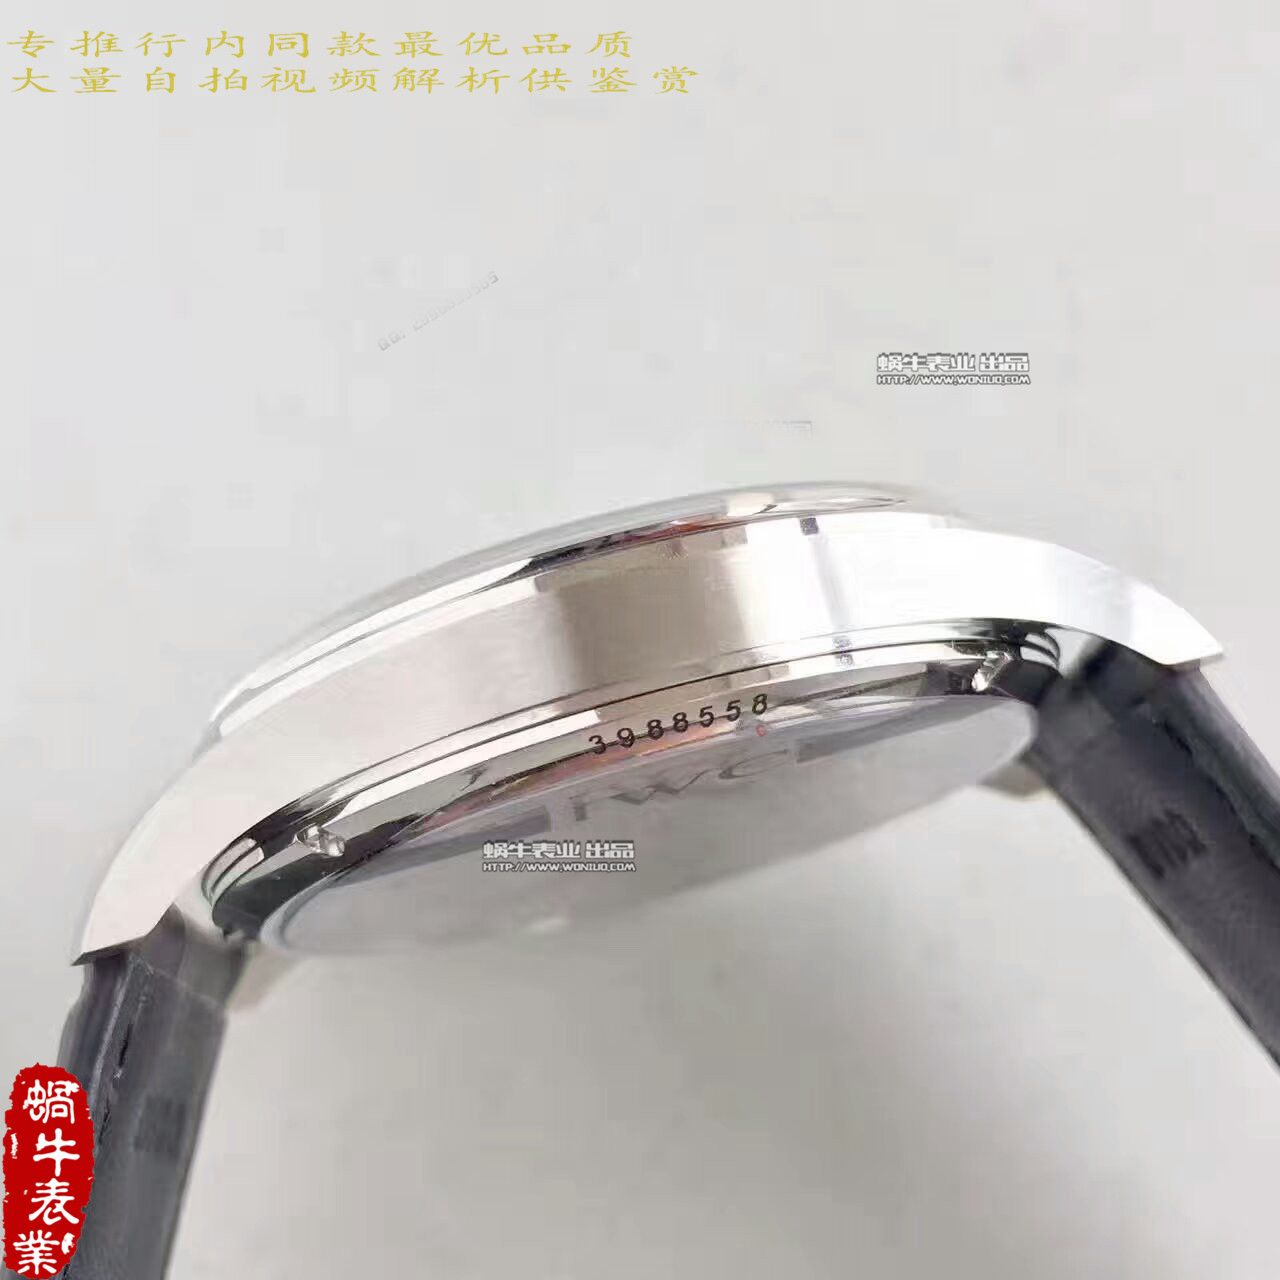 【YL厂顶级复刻手表】万国葡萄牙三针一线系列琼斯之剑IW544401腕表 / WG306